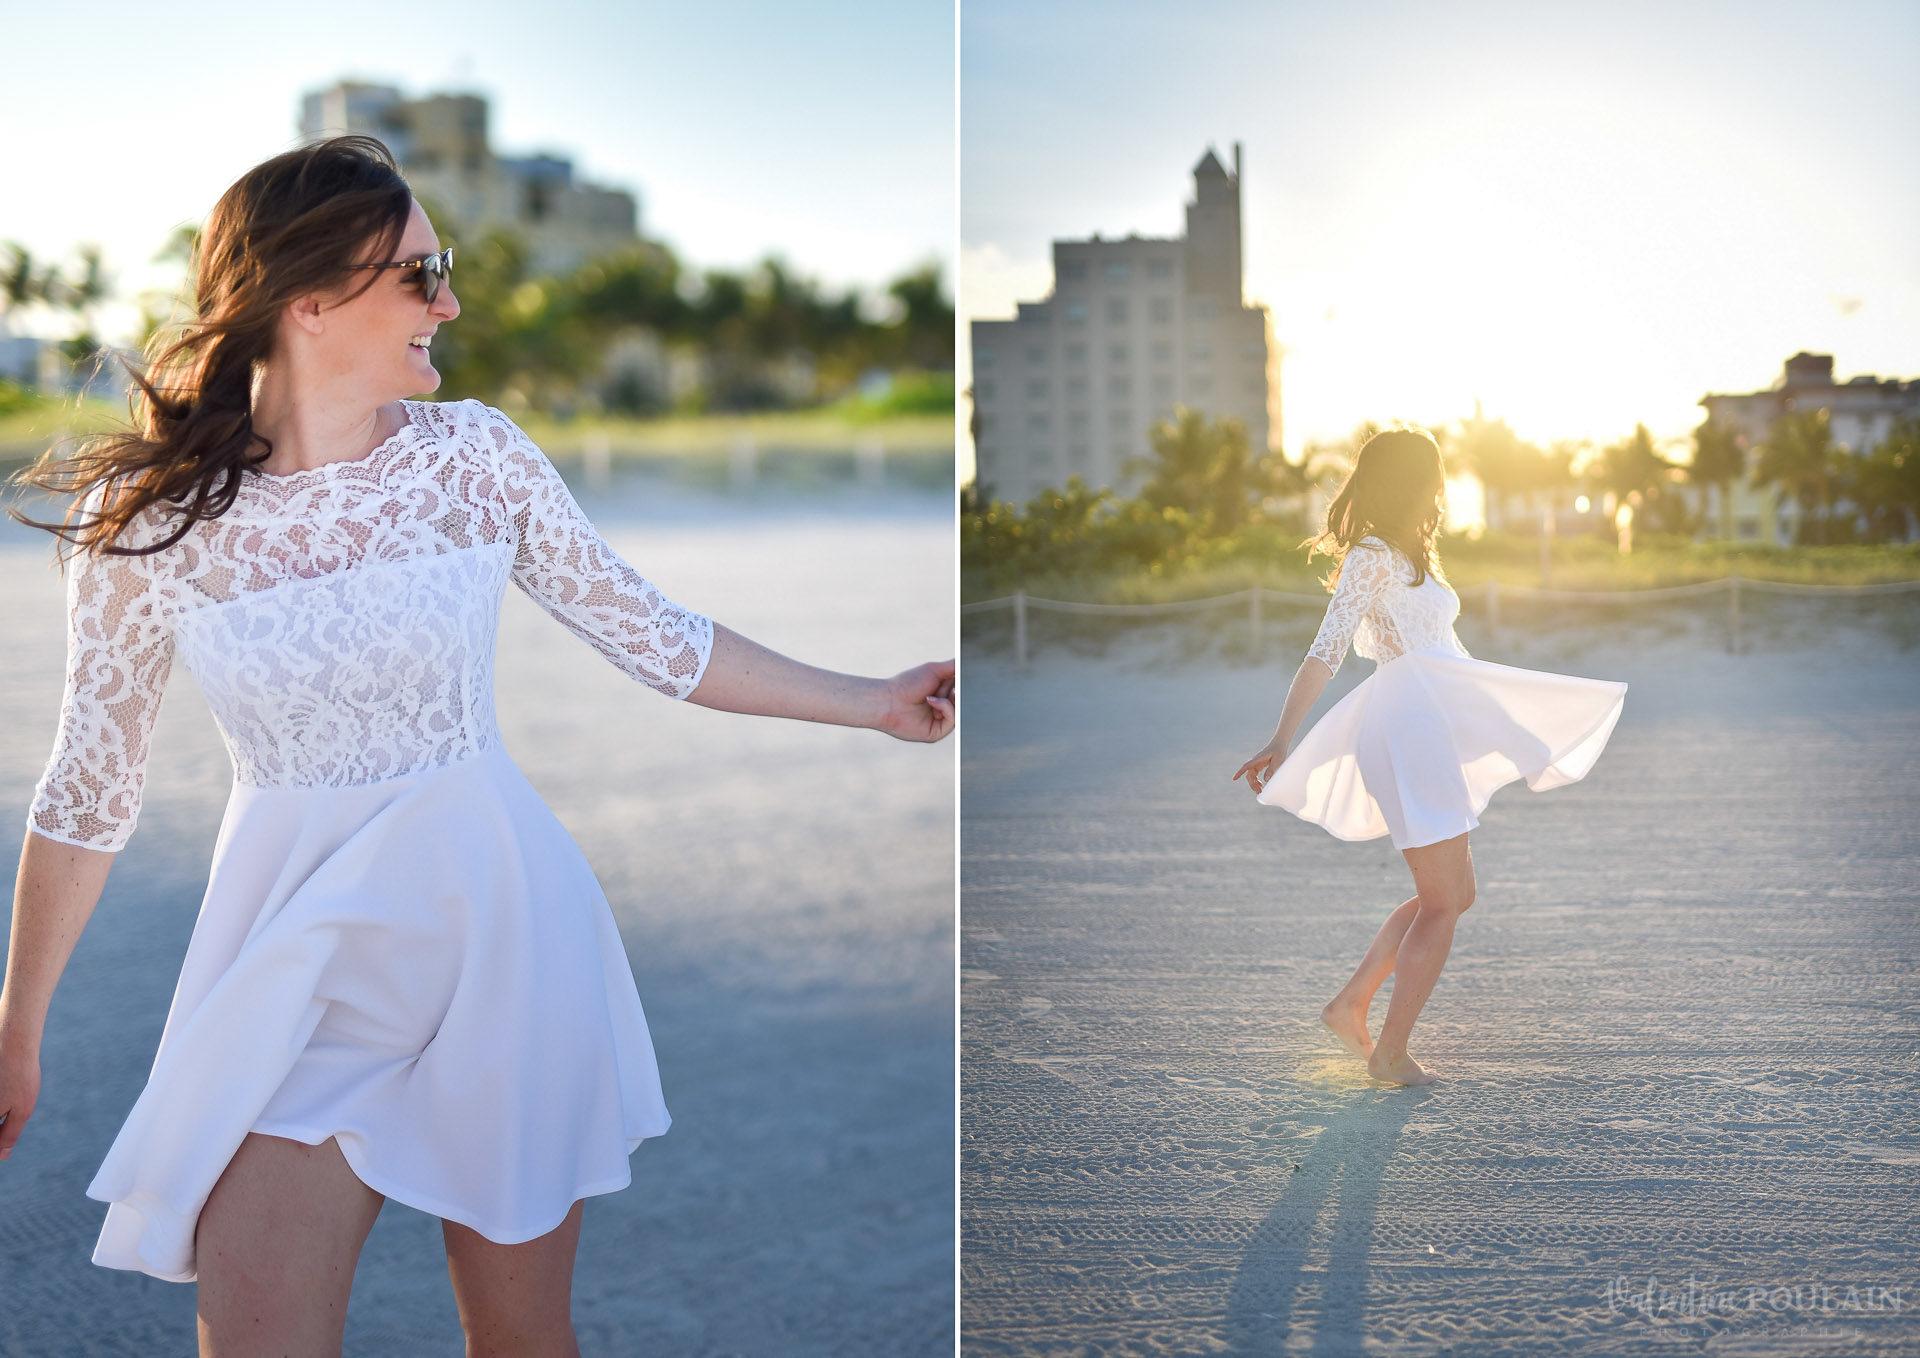 Day after Miami - Valentine Poulain dress